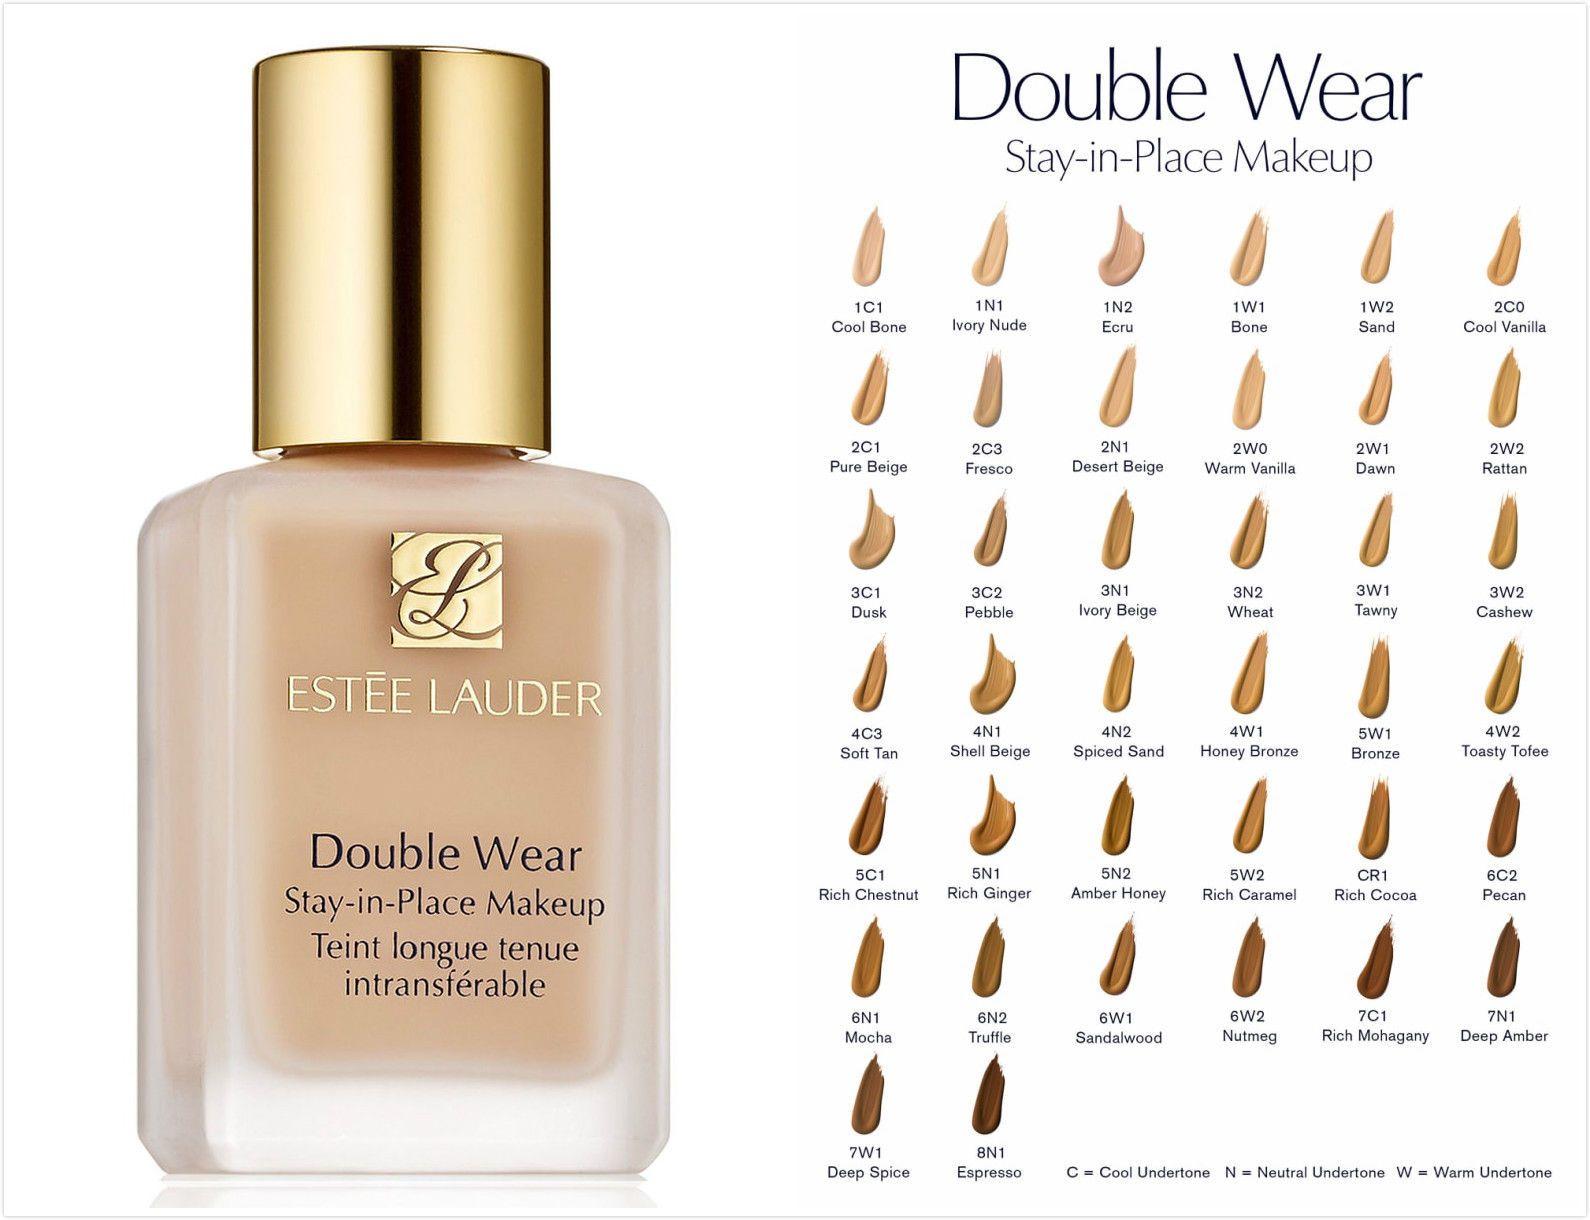 Estee Lauder Double Wear StayinPlace